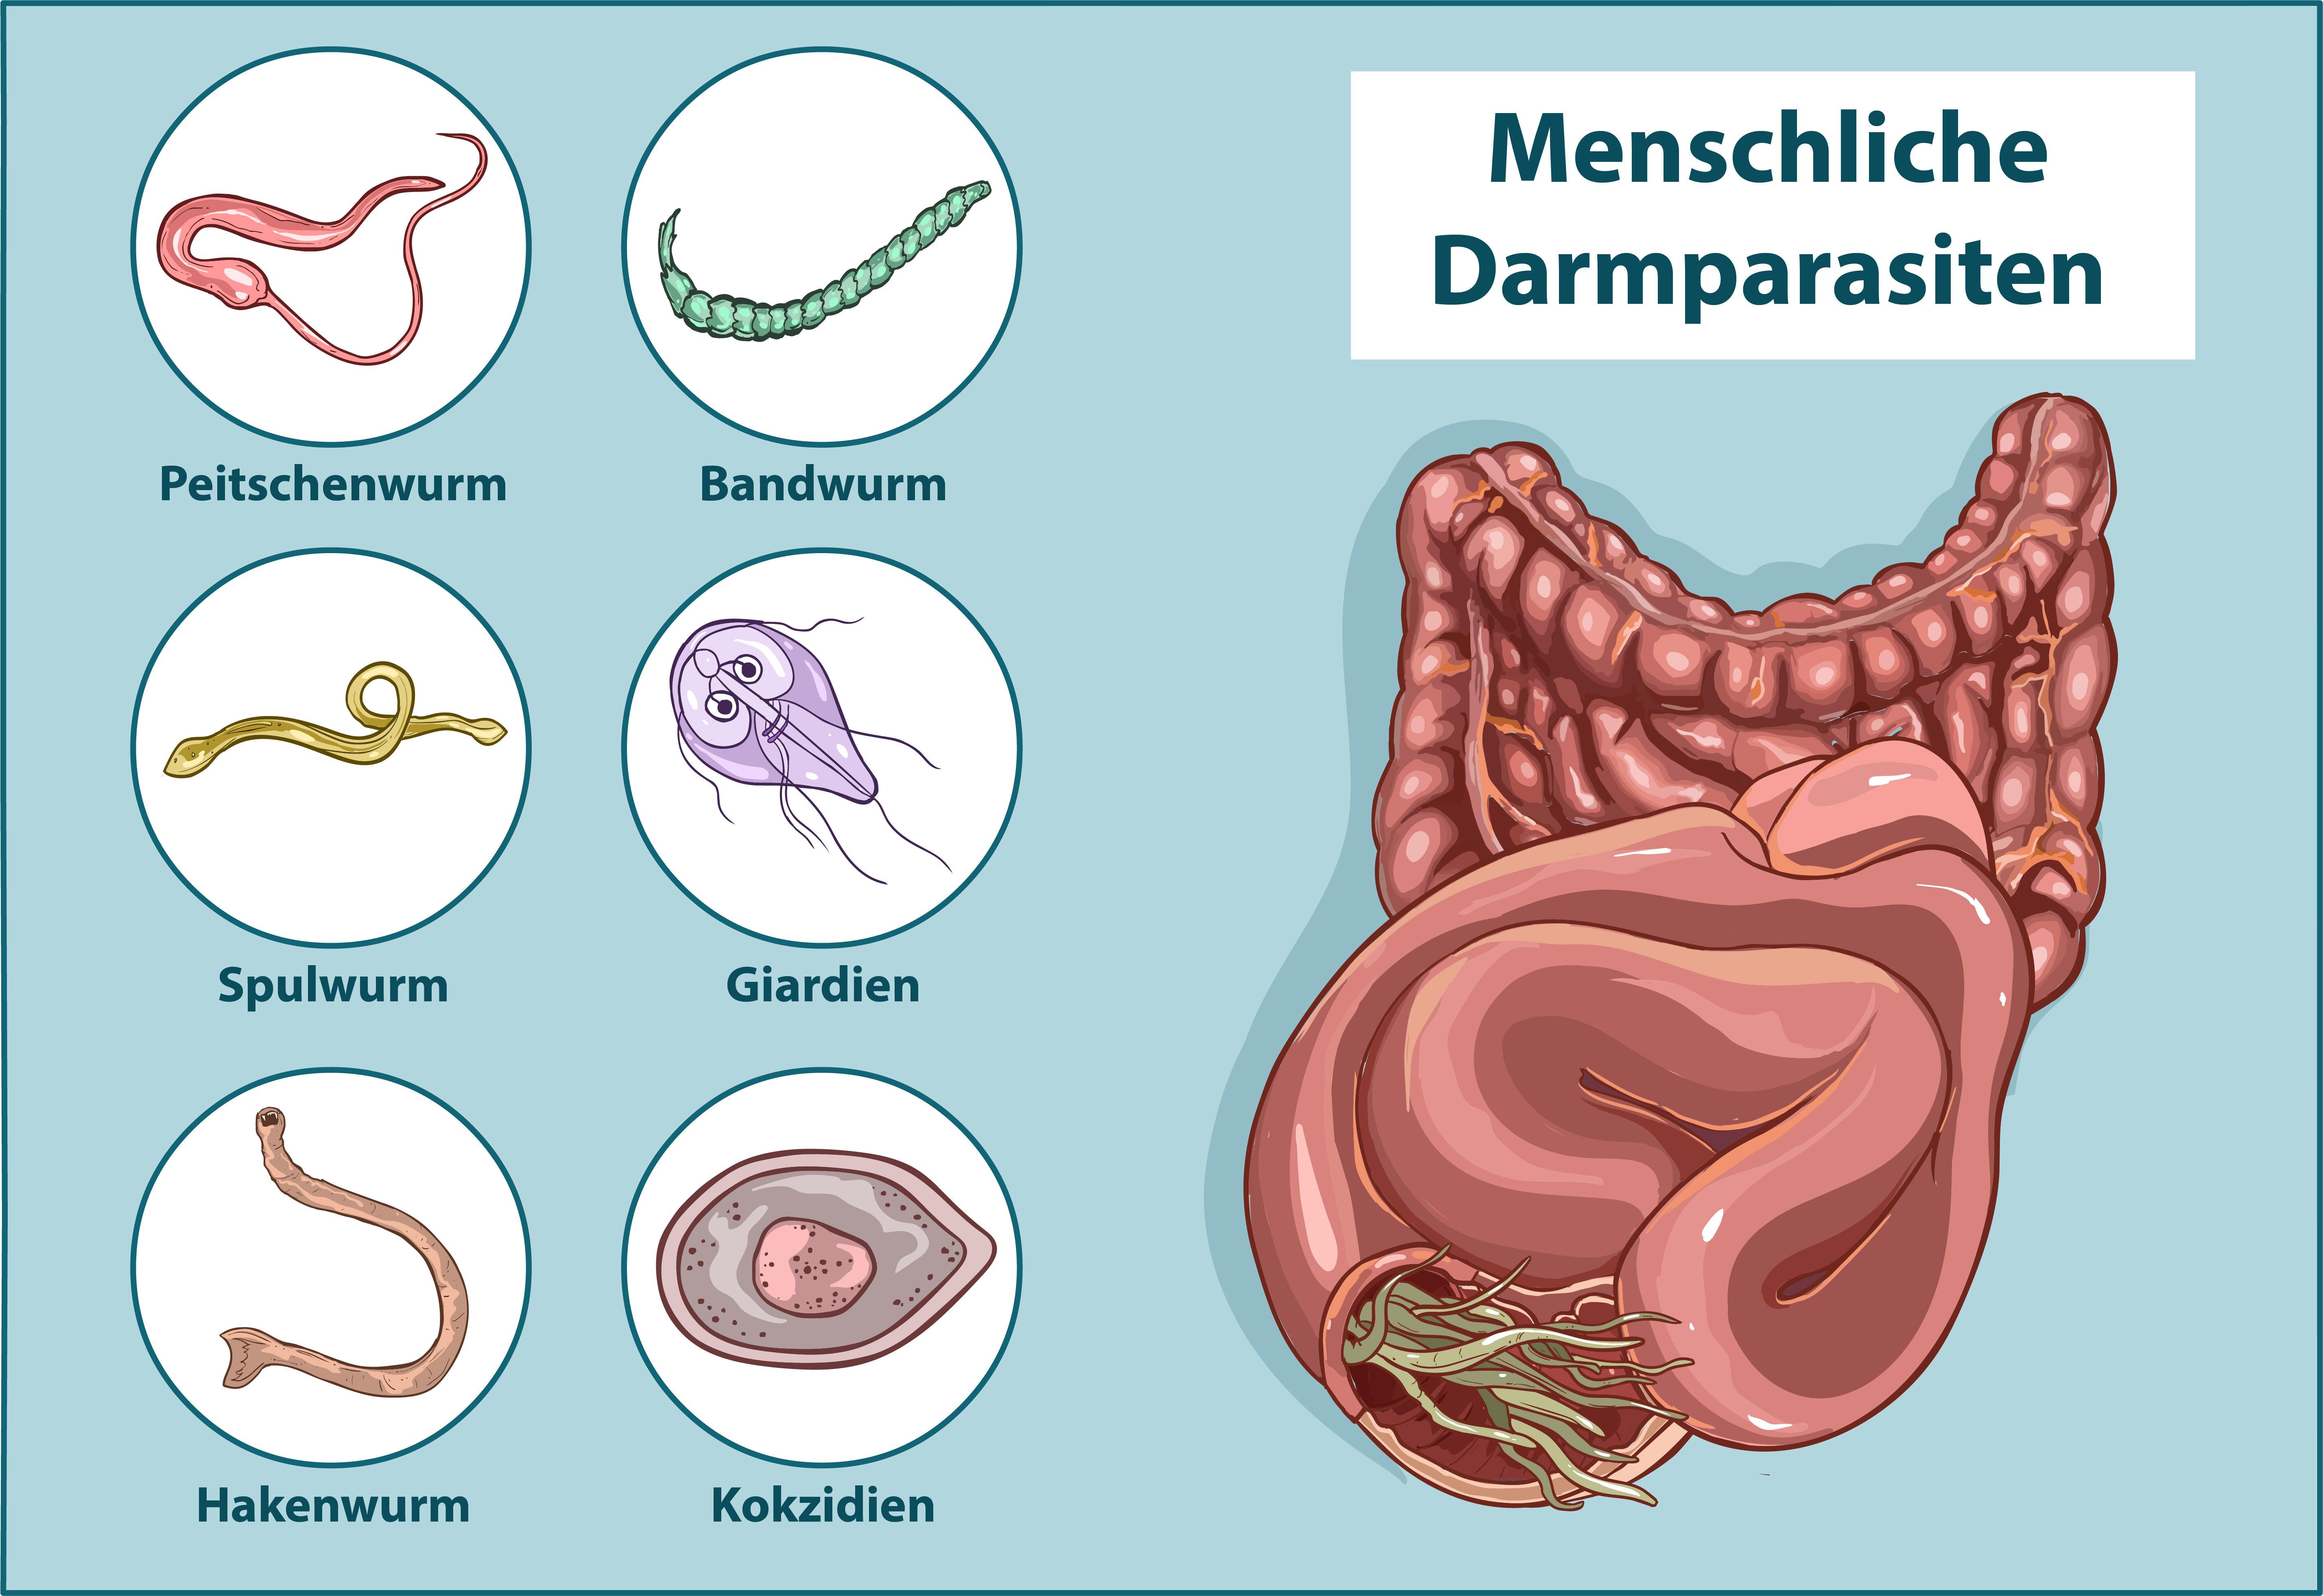 Hogyan lehet kezelni az aszcariasist terhes nőkben - andrea-design.hu, Giardien mensch medikamente